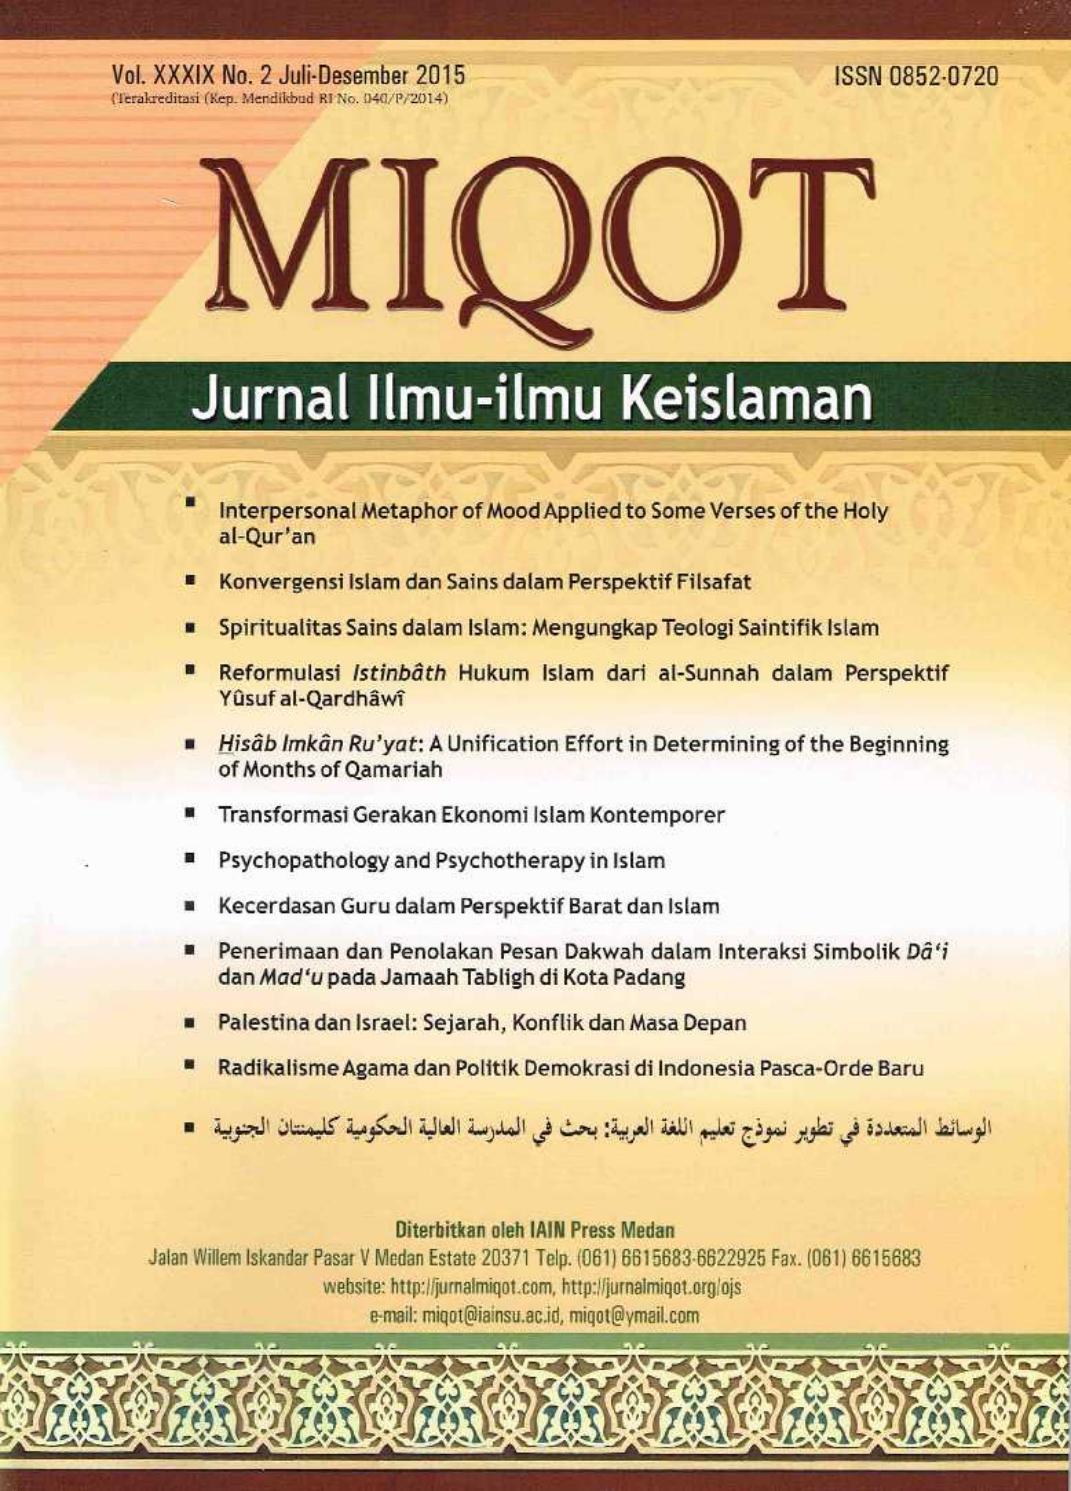 MIQOT VOL XXXIX NO 2 JULI DESEMBER 2015 By MIQOT Jurnal